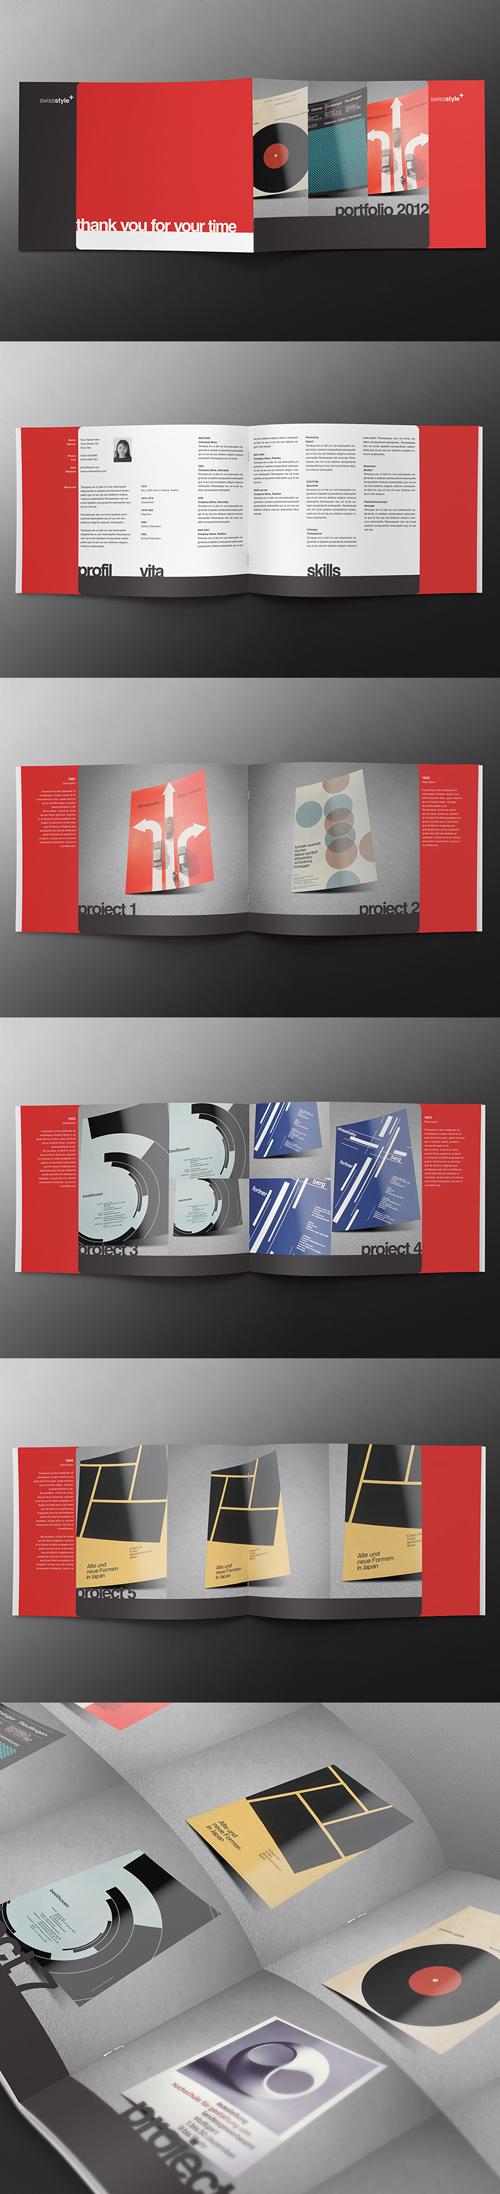 Swiss Series - Landscape A4 Brochure